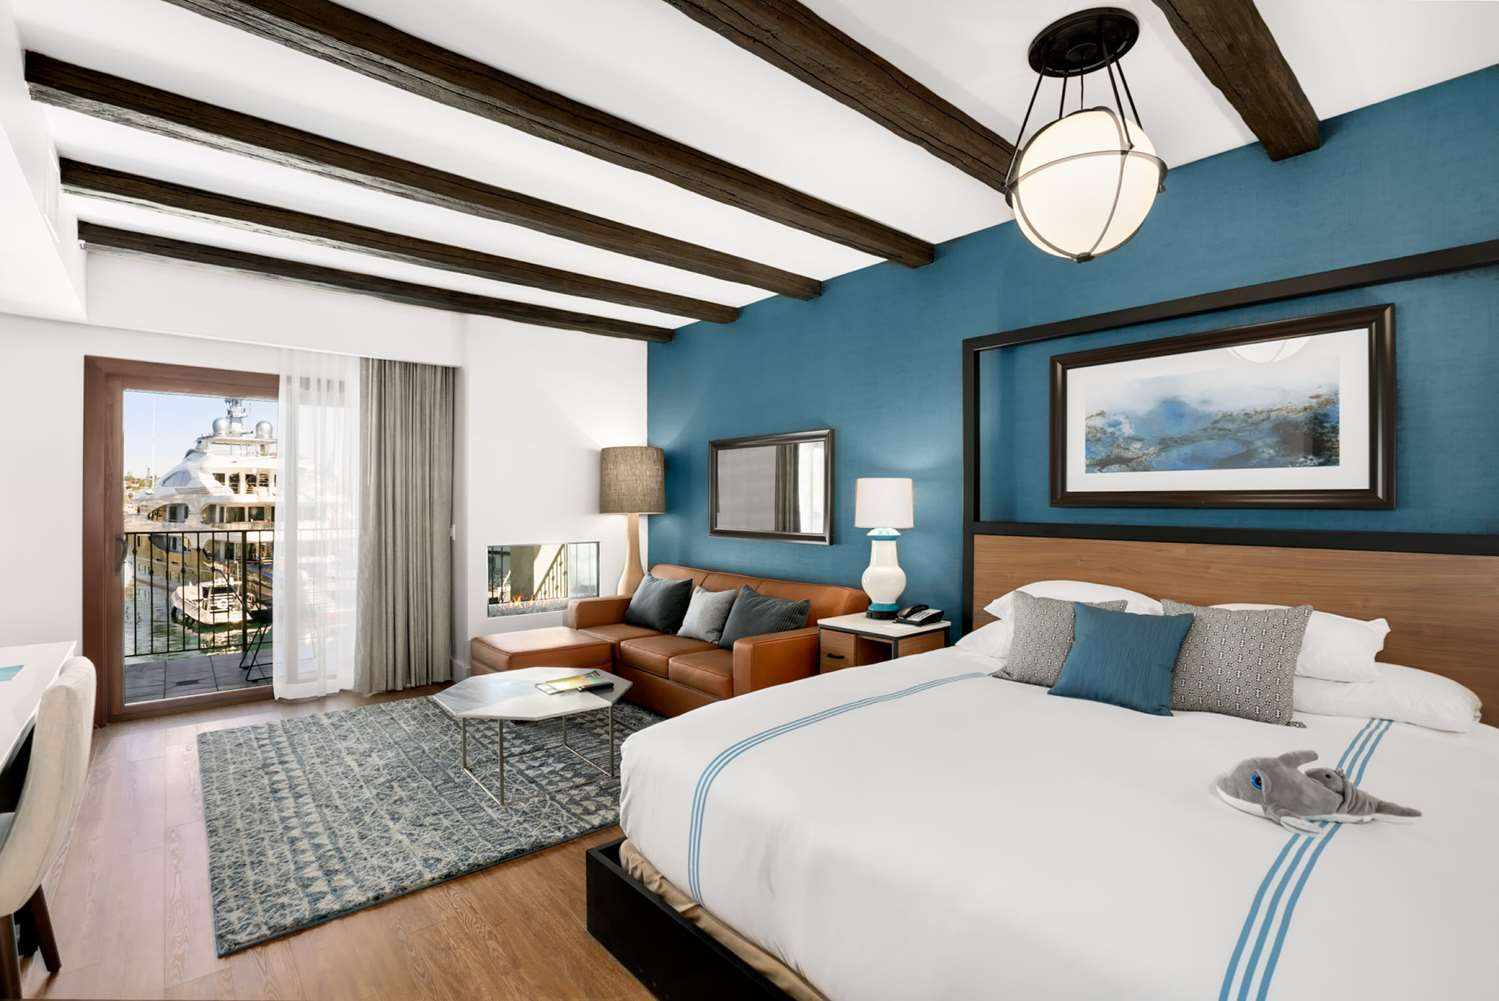 Hotels Near Point Loma Nazarene University